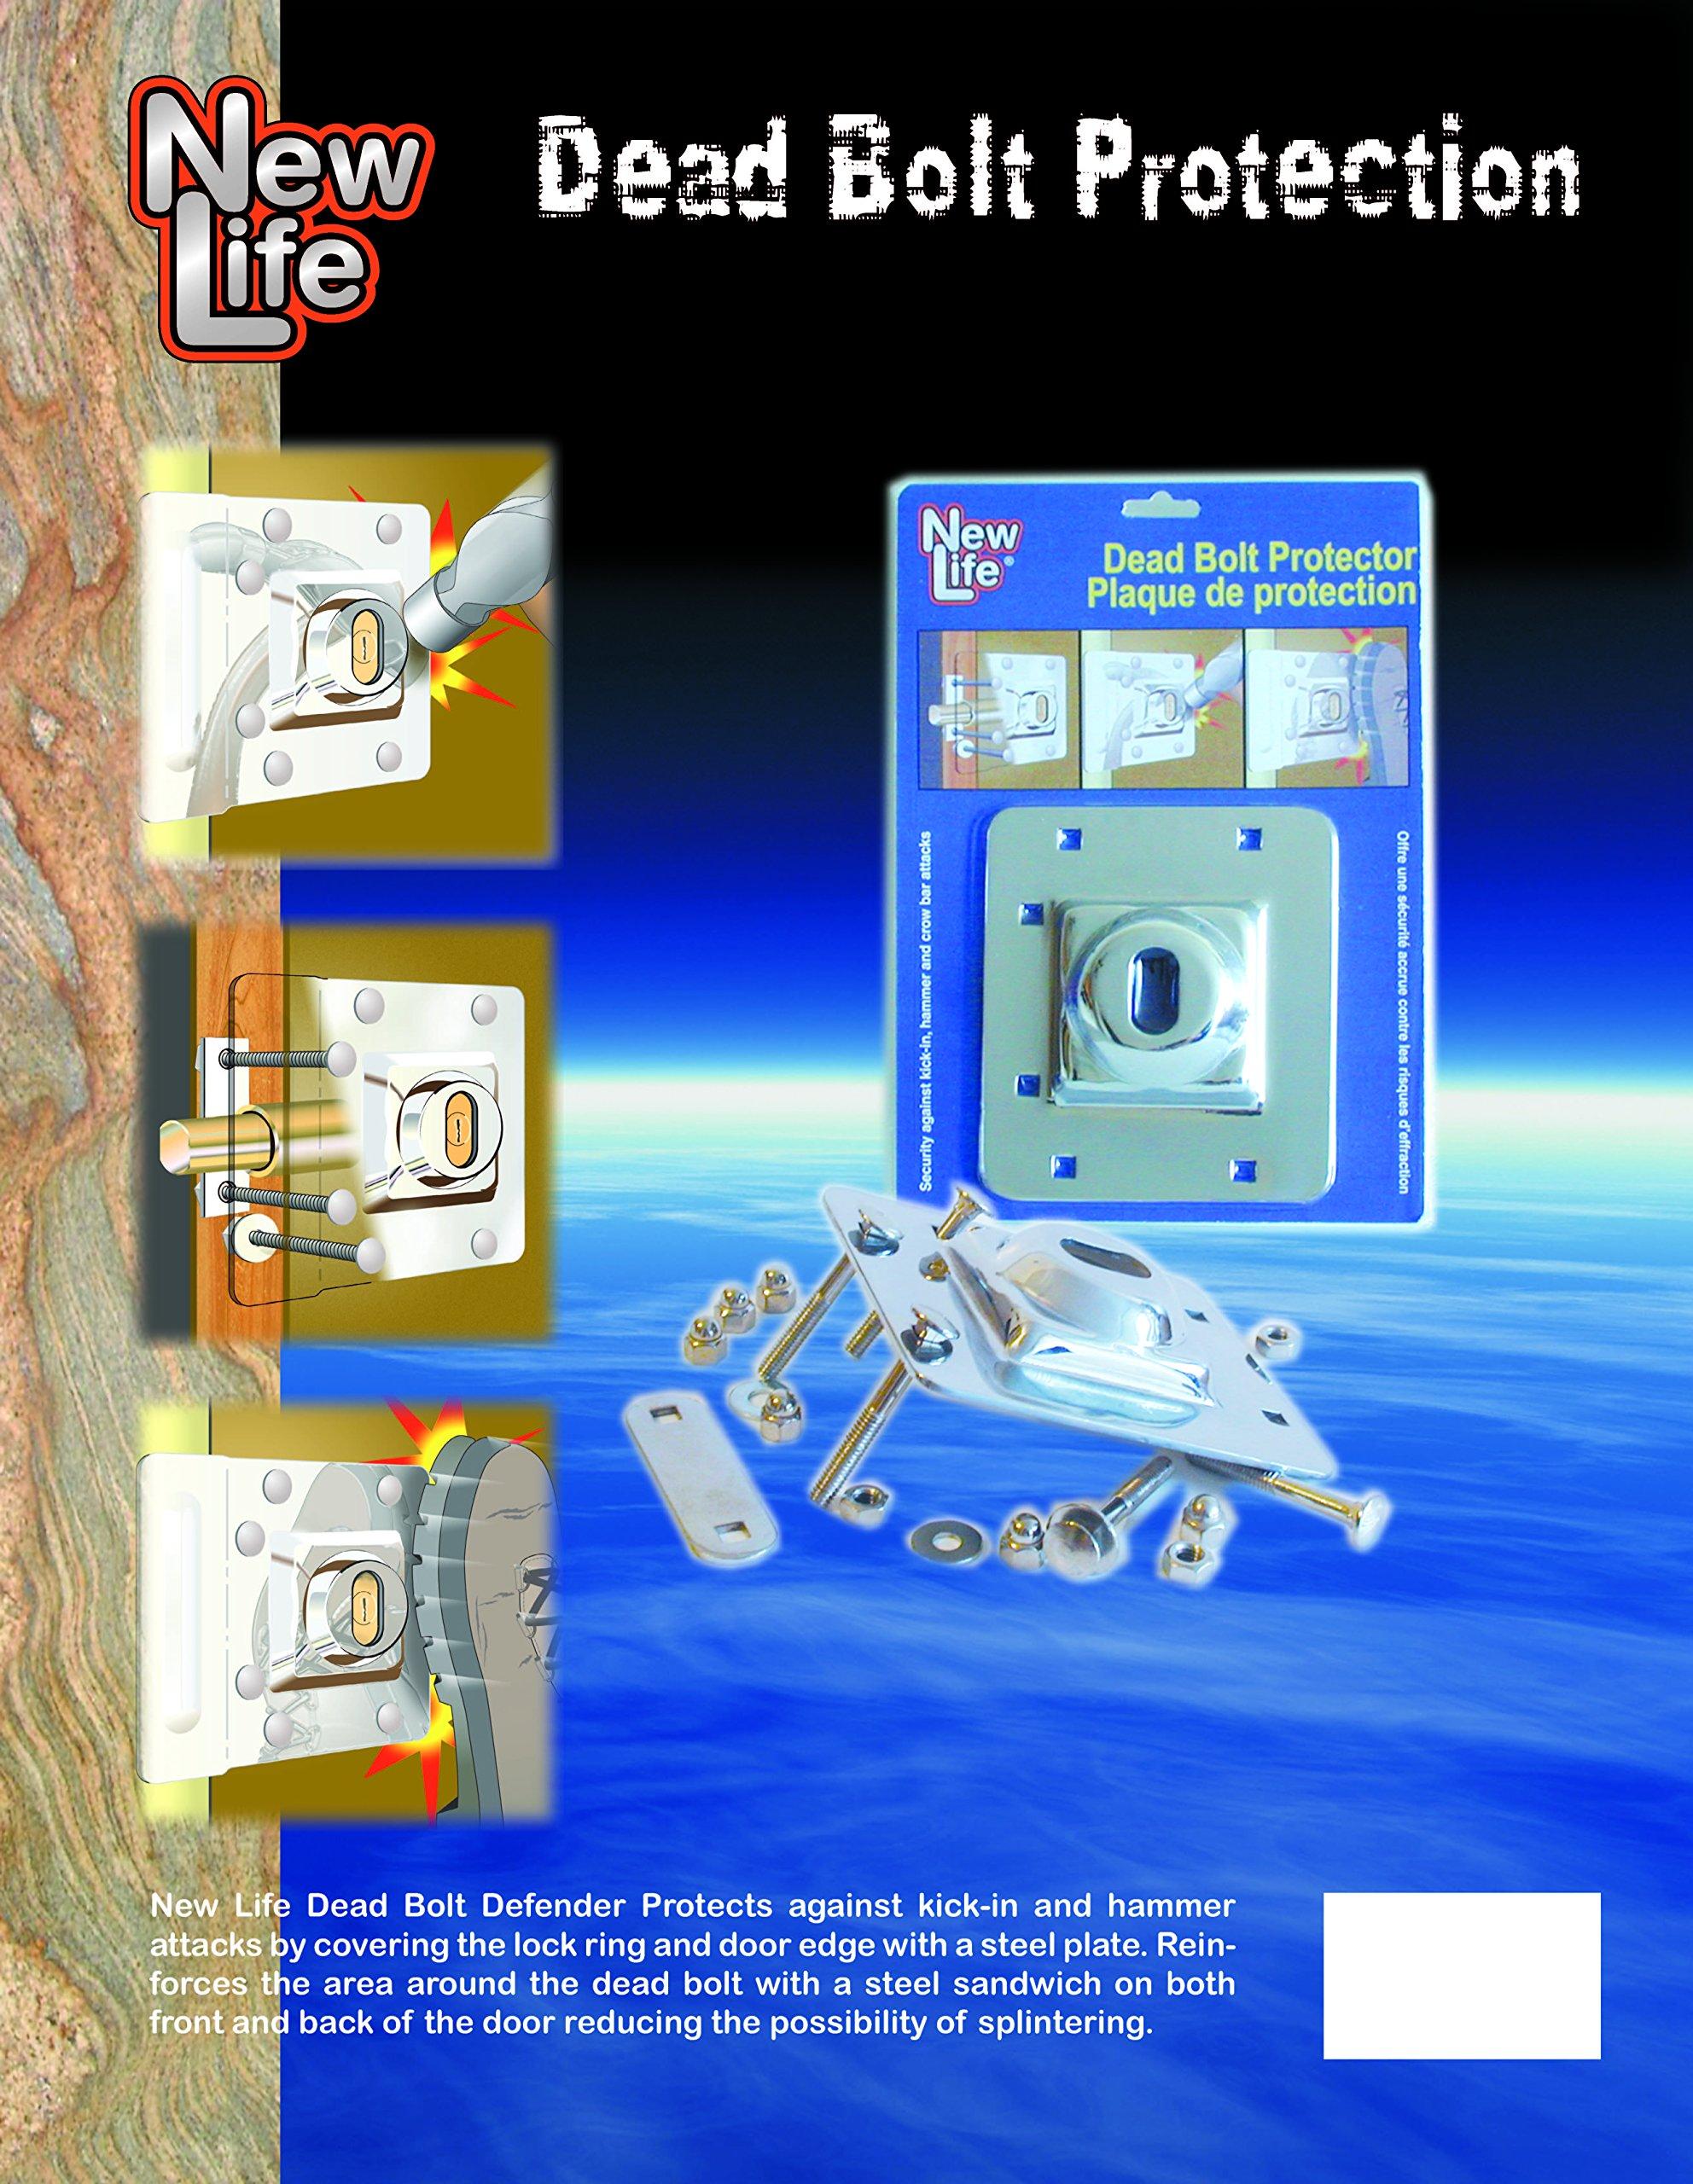 New Life Products 37-652IS Door Deadbolt Defender, Latch Guard, Door Reinforcer 5 IN X 5.8 IN Inswing, Protects Inswinging door from forced entry, Replacement For Prime-Line Door Reinforcer U9496